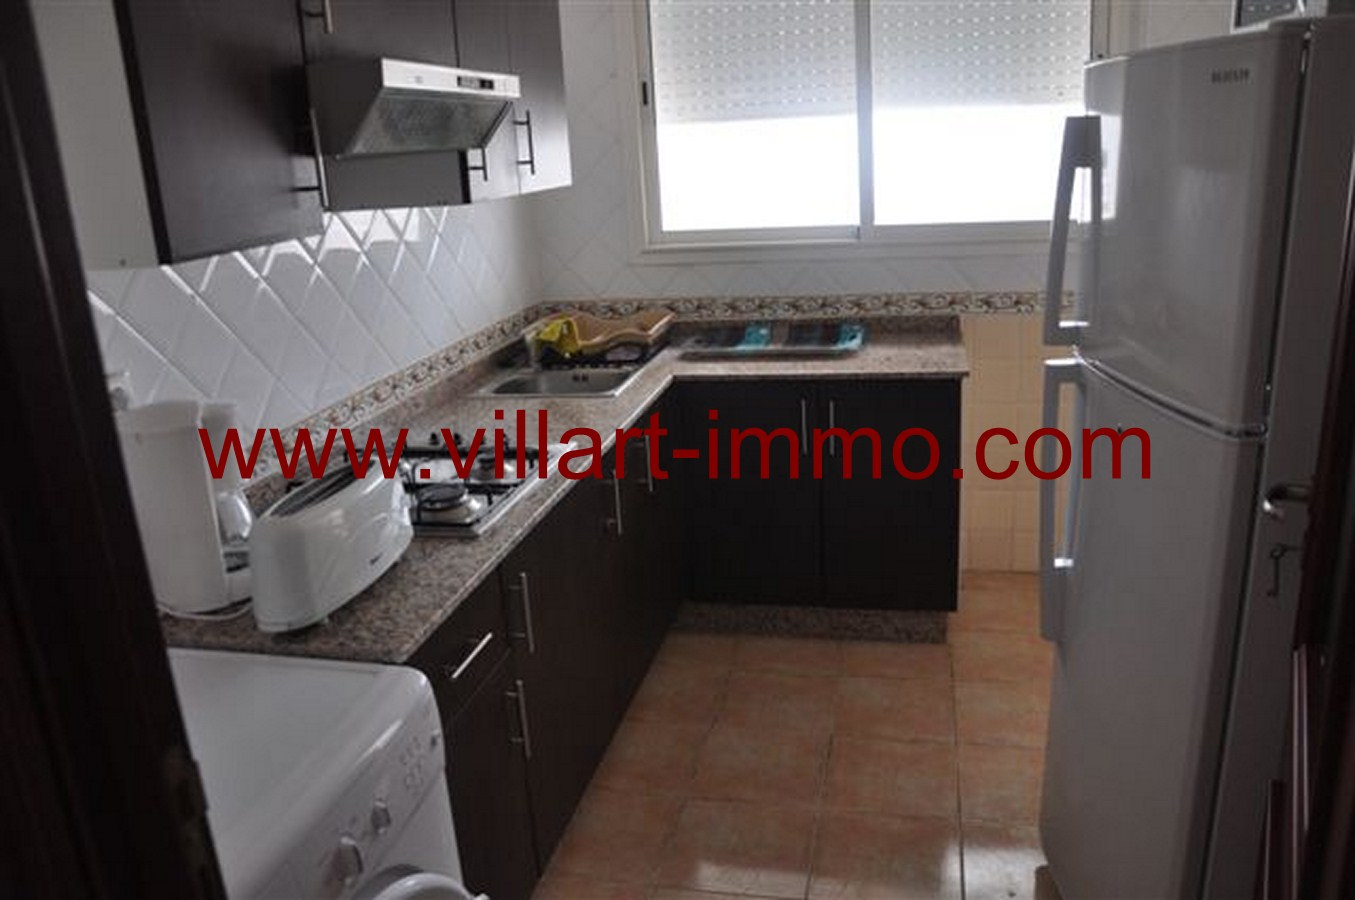 4-Vente-Appartement-Tanger-Route-de-Rabat-Cuisine-VA521-Villart Immo